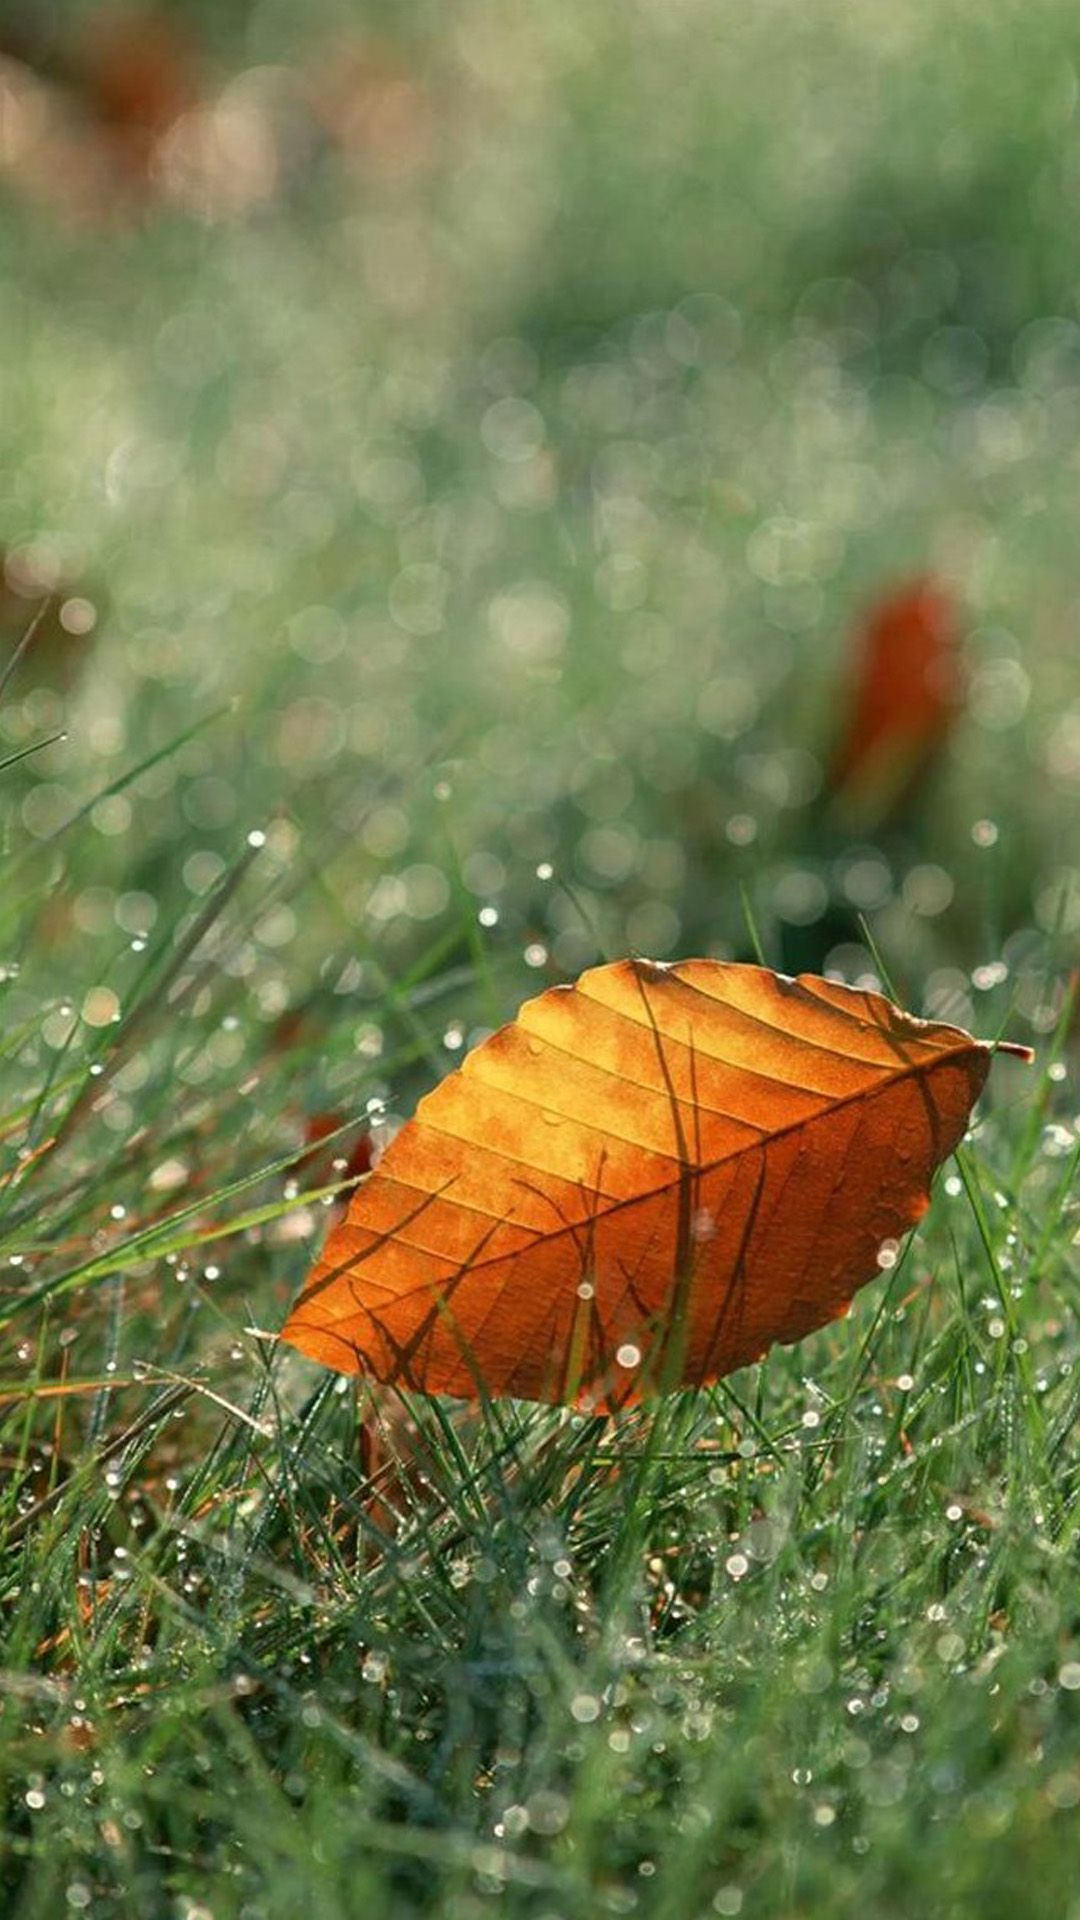 Brown Fall Leaf On Dew Grassland iPhone 6 plus wallpaper